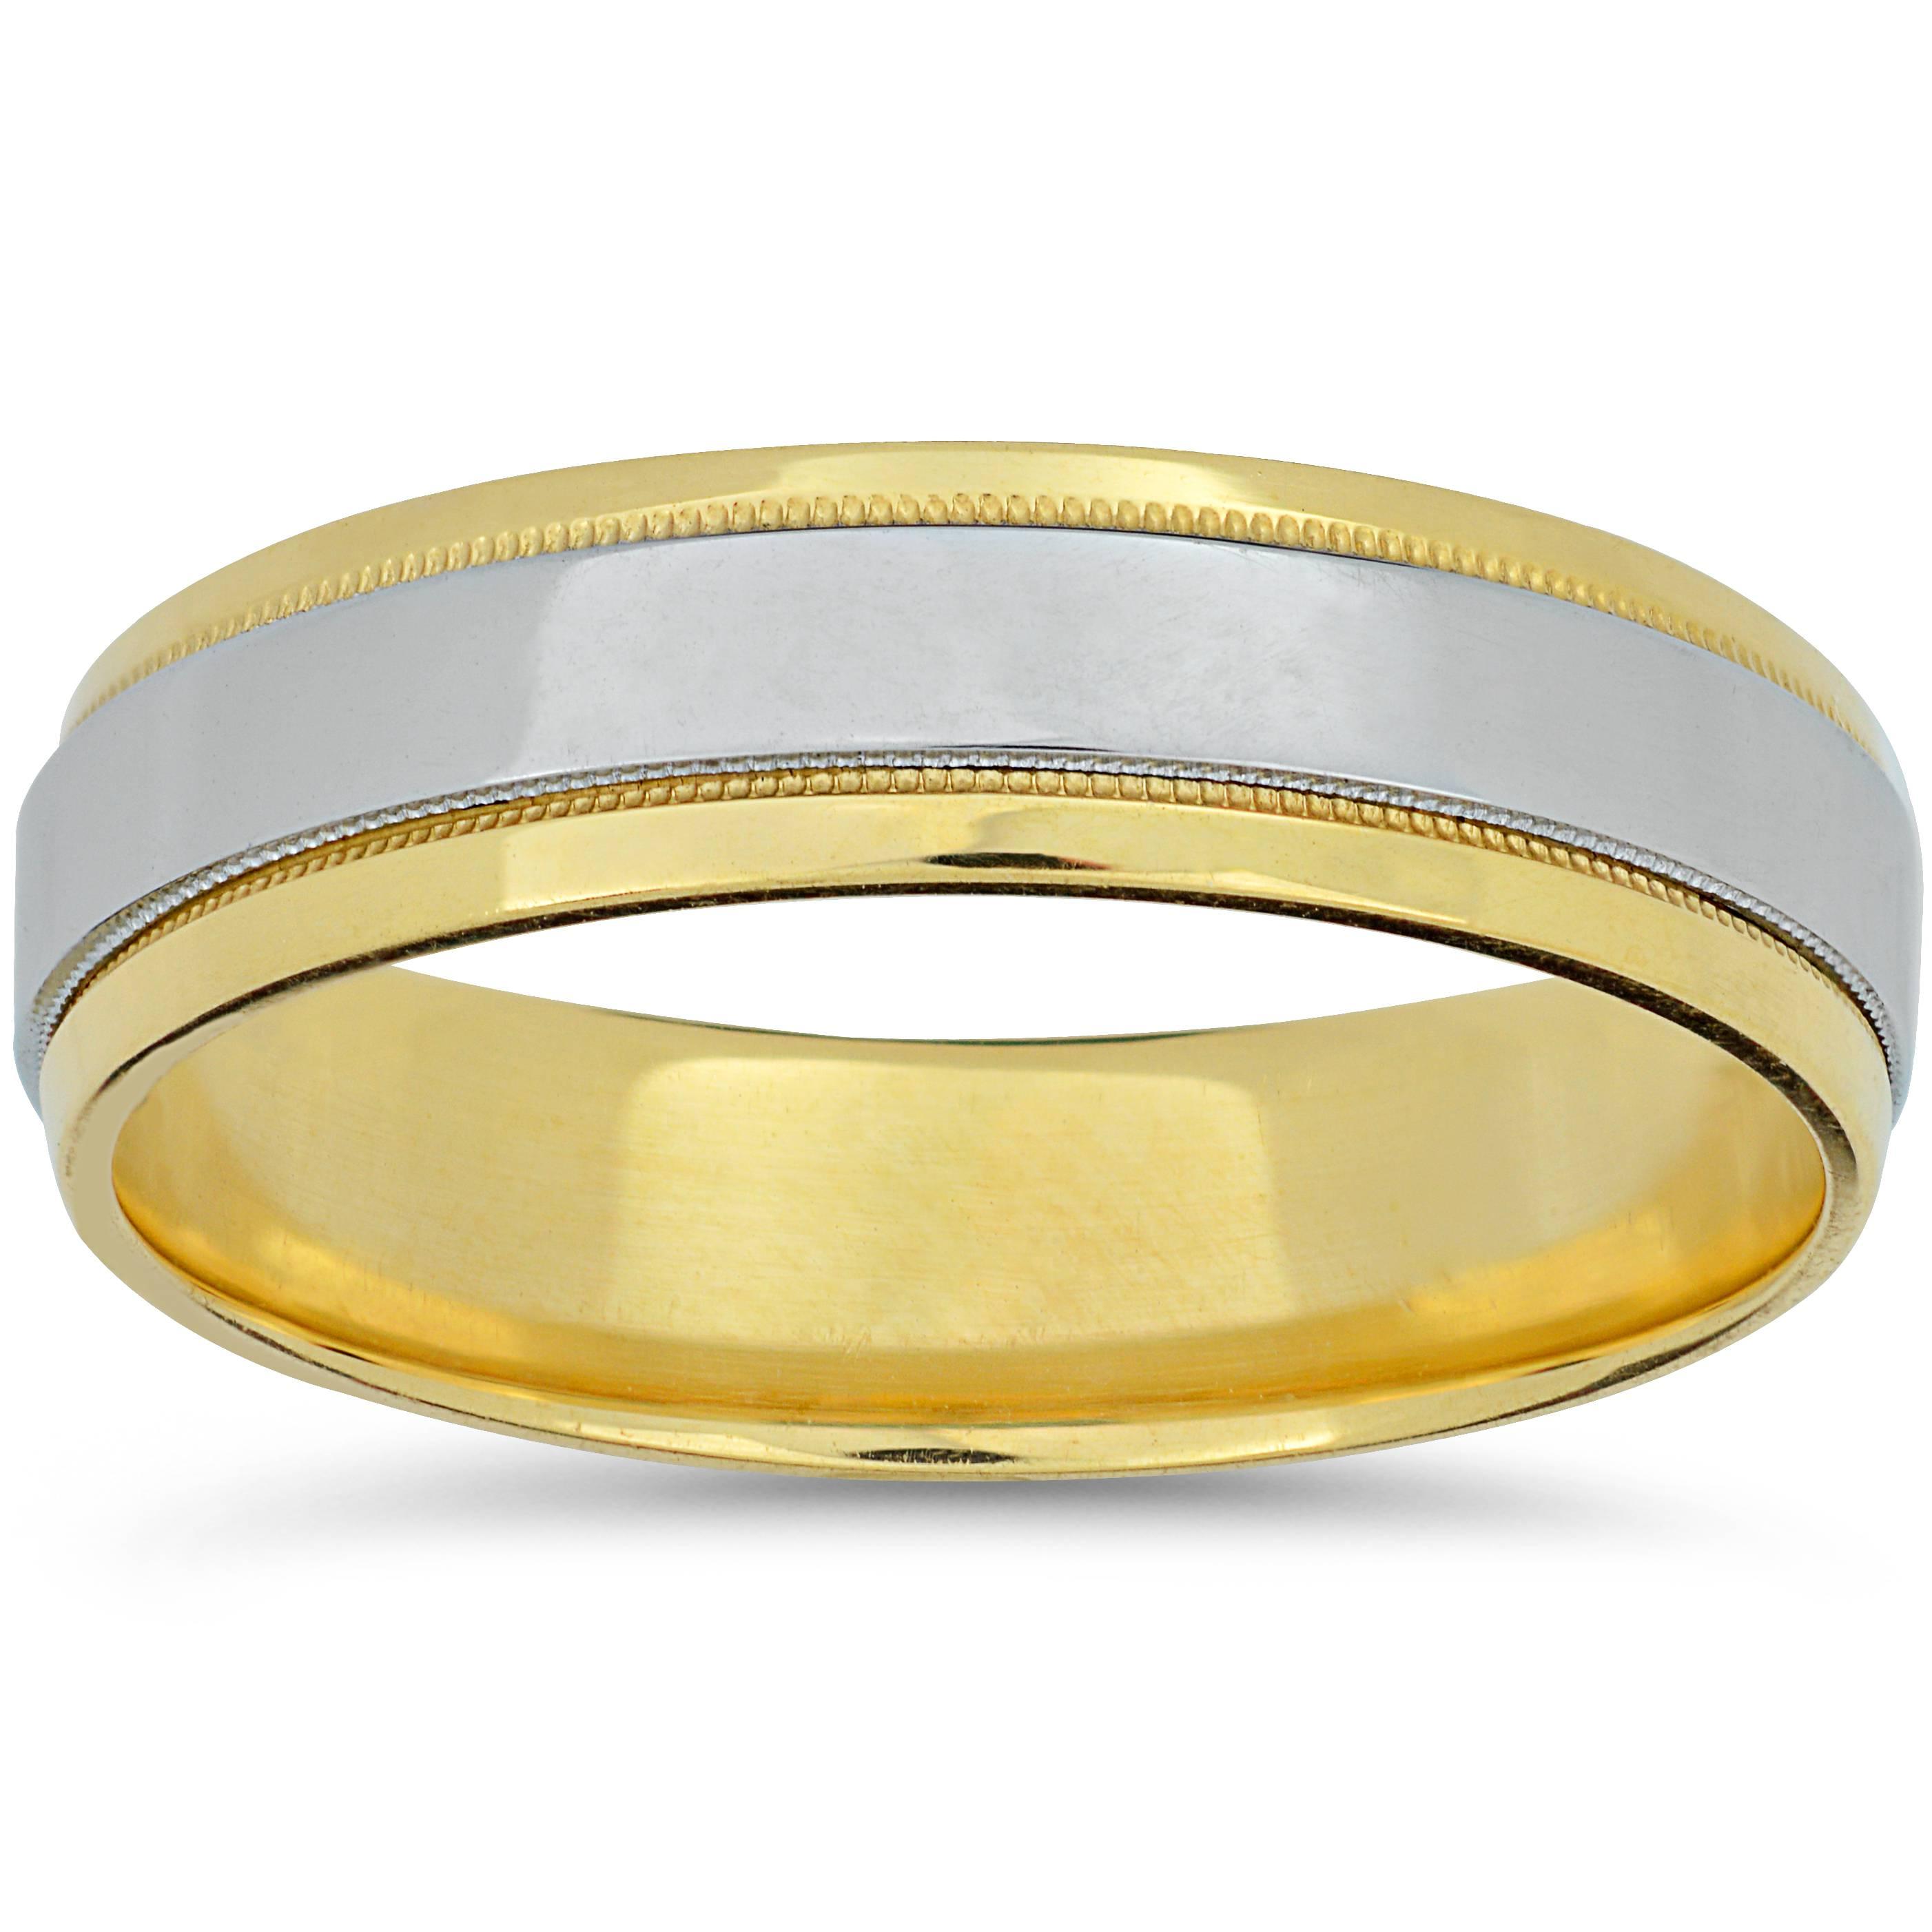 Mens Platinum & 18k Yellow Gold Two Tone Wedding Band High